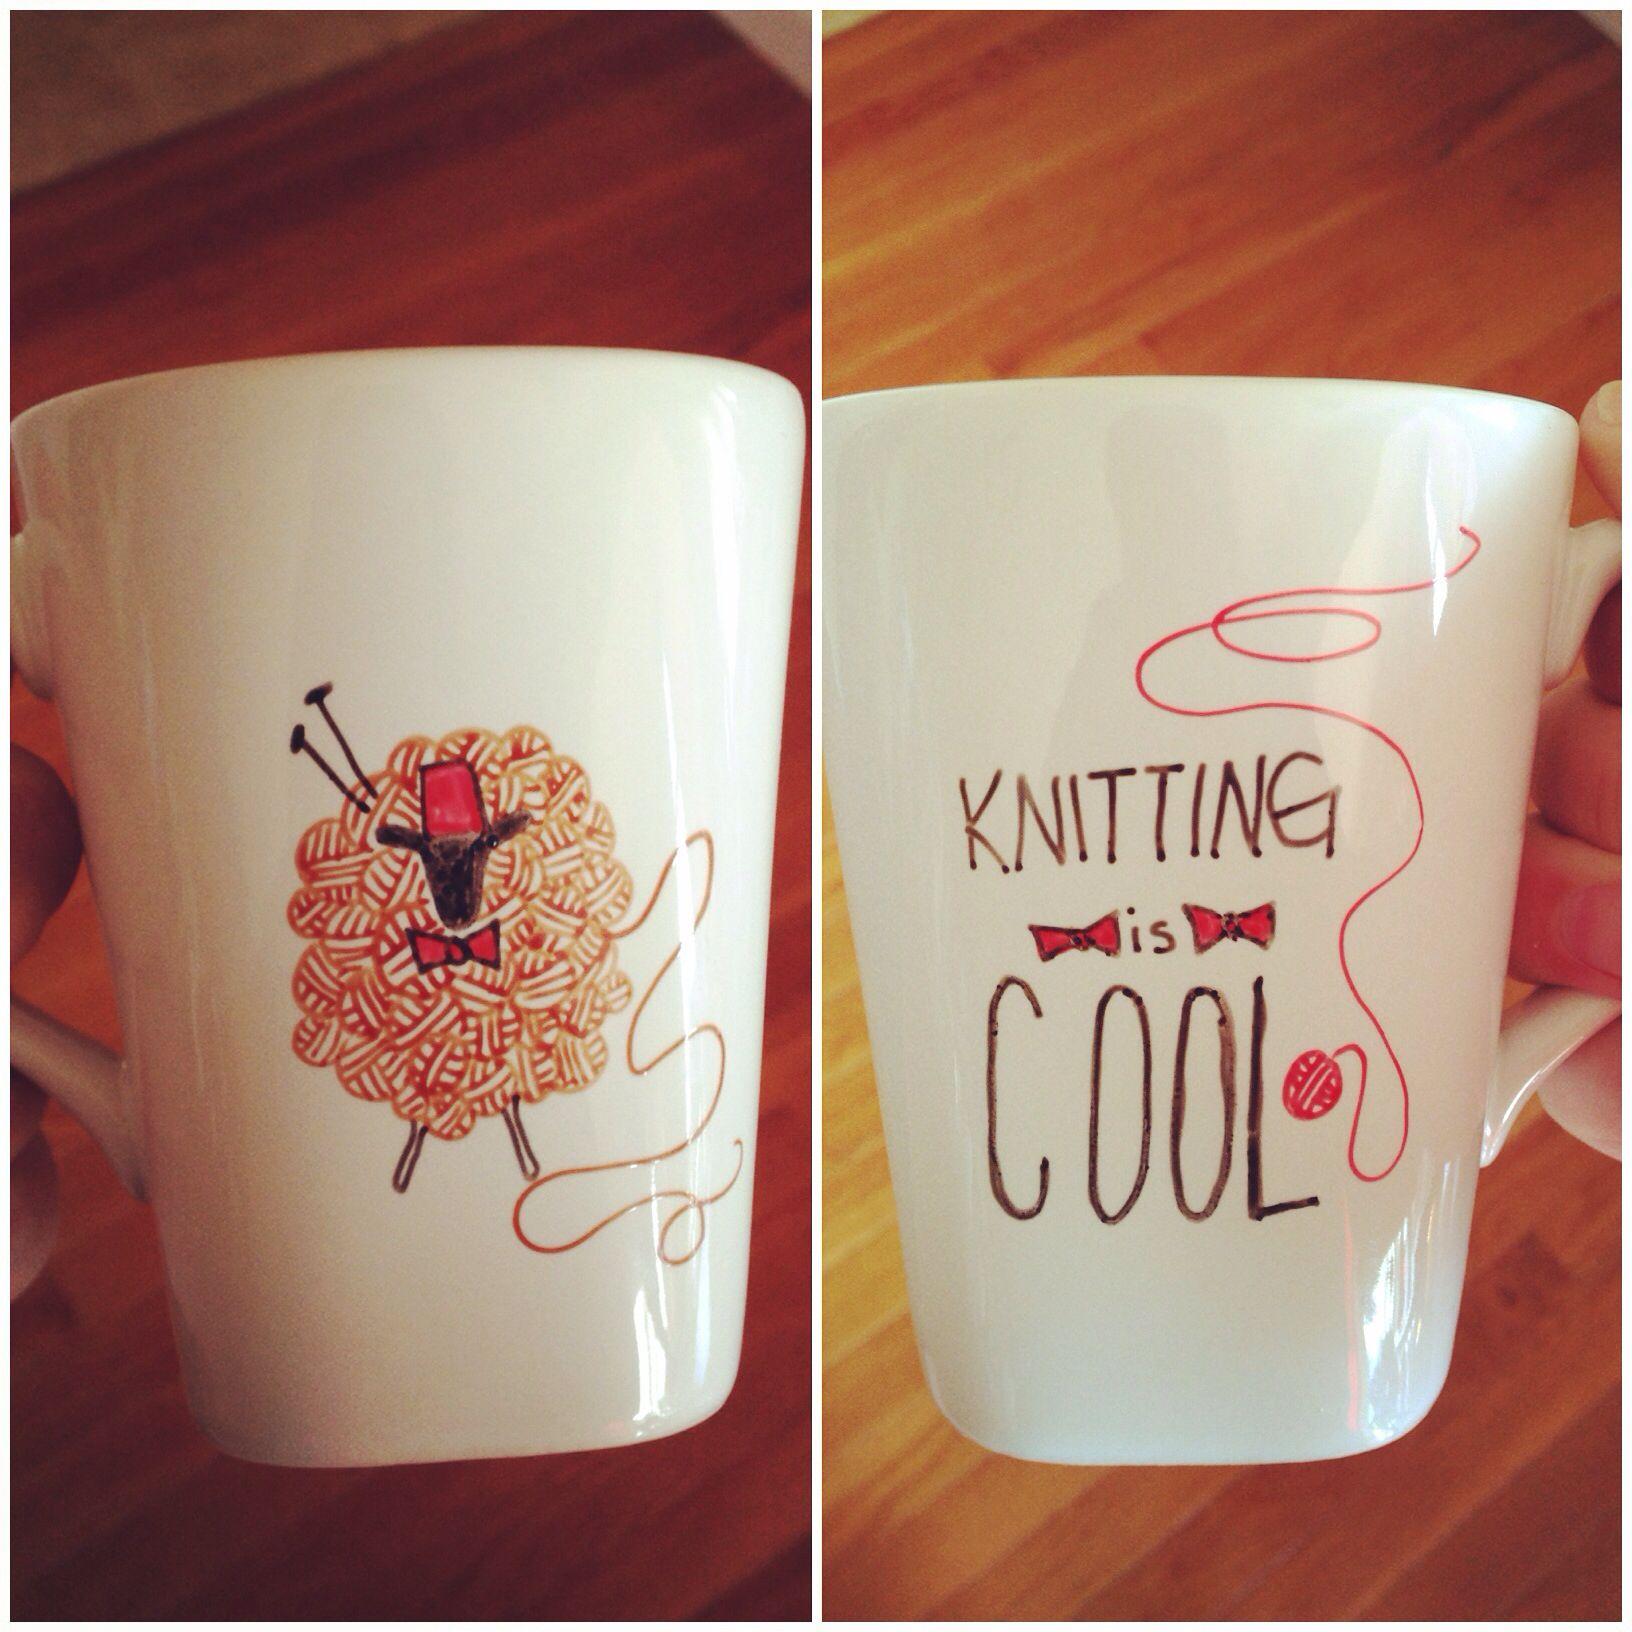 Knitting is Cool mug   #doctorwho #sheep #knitting